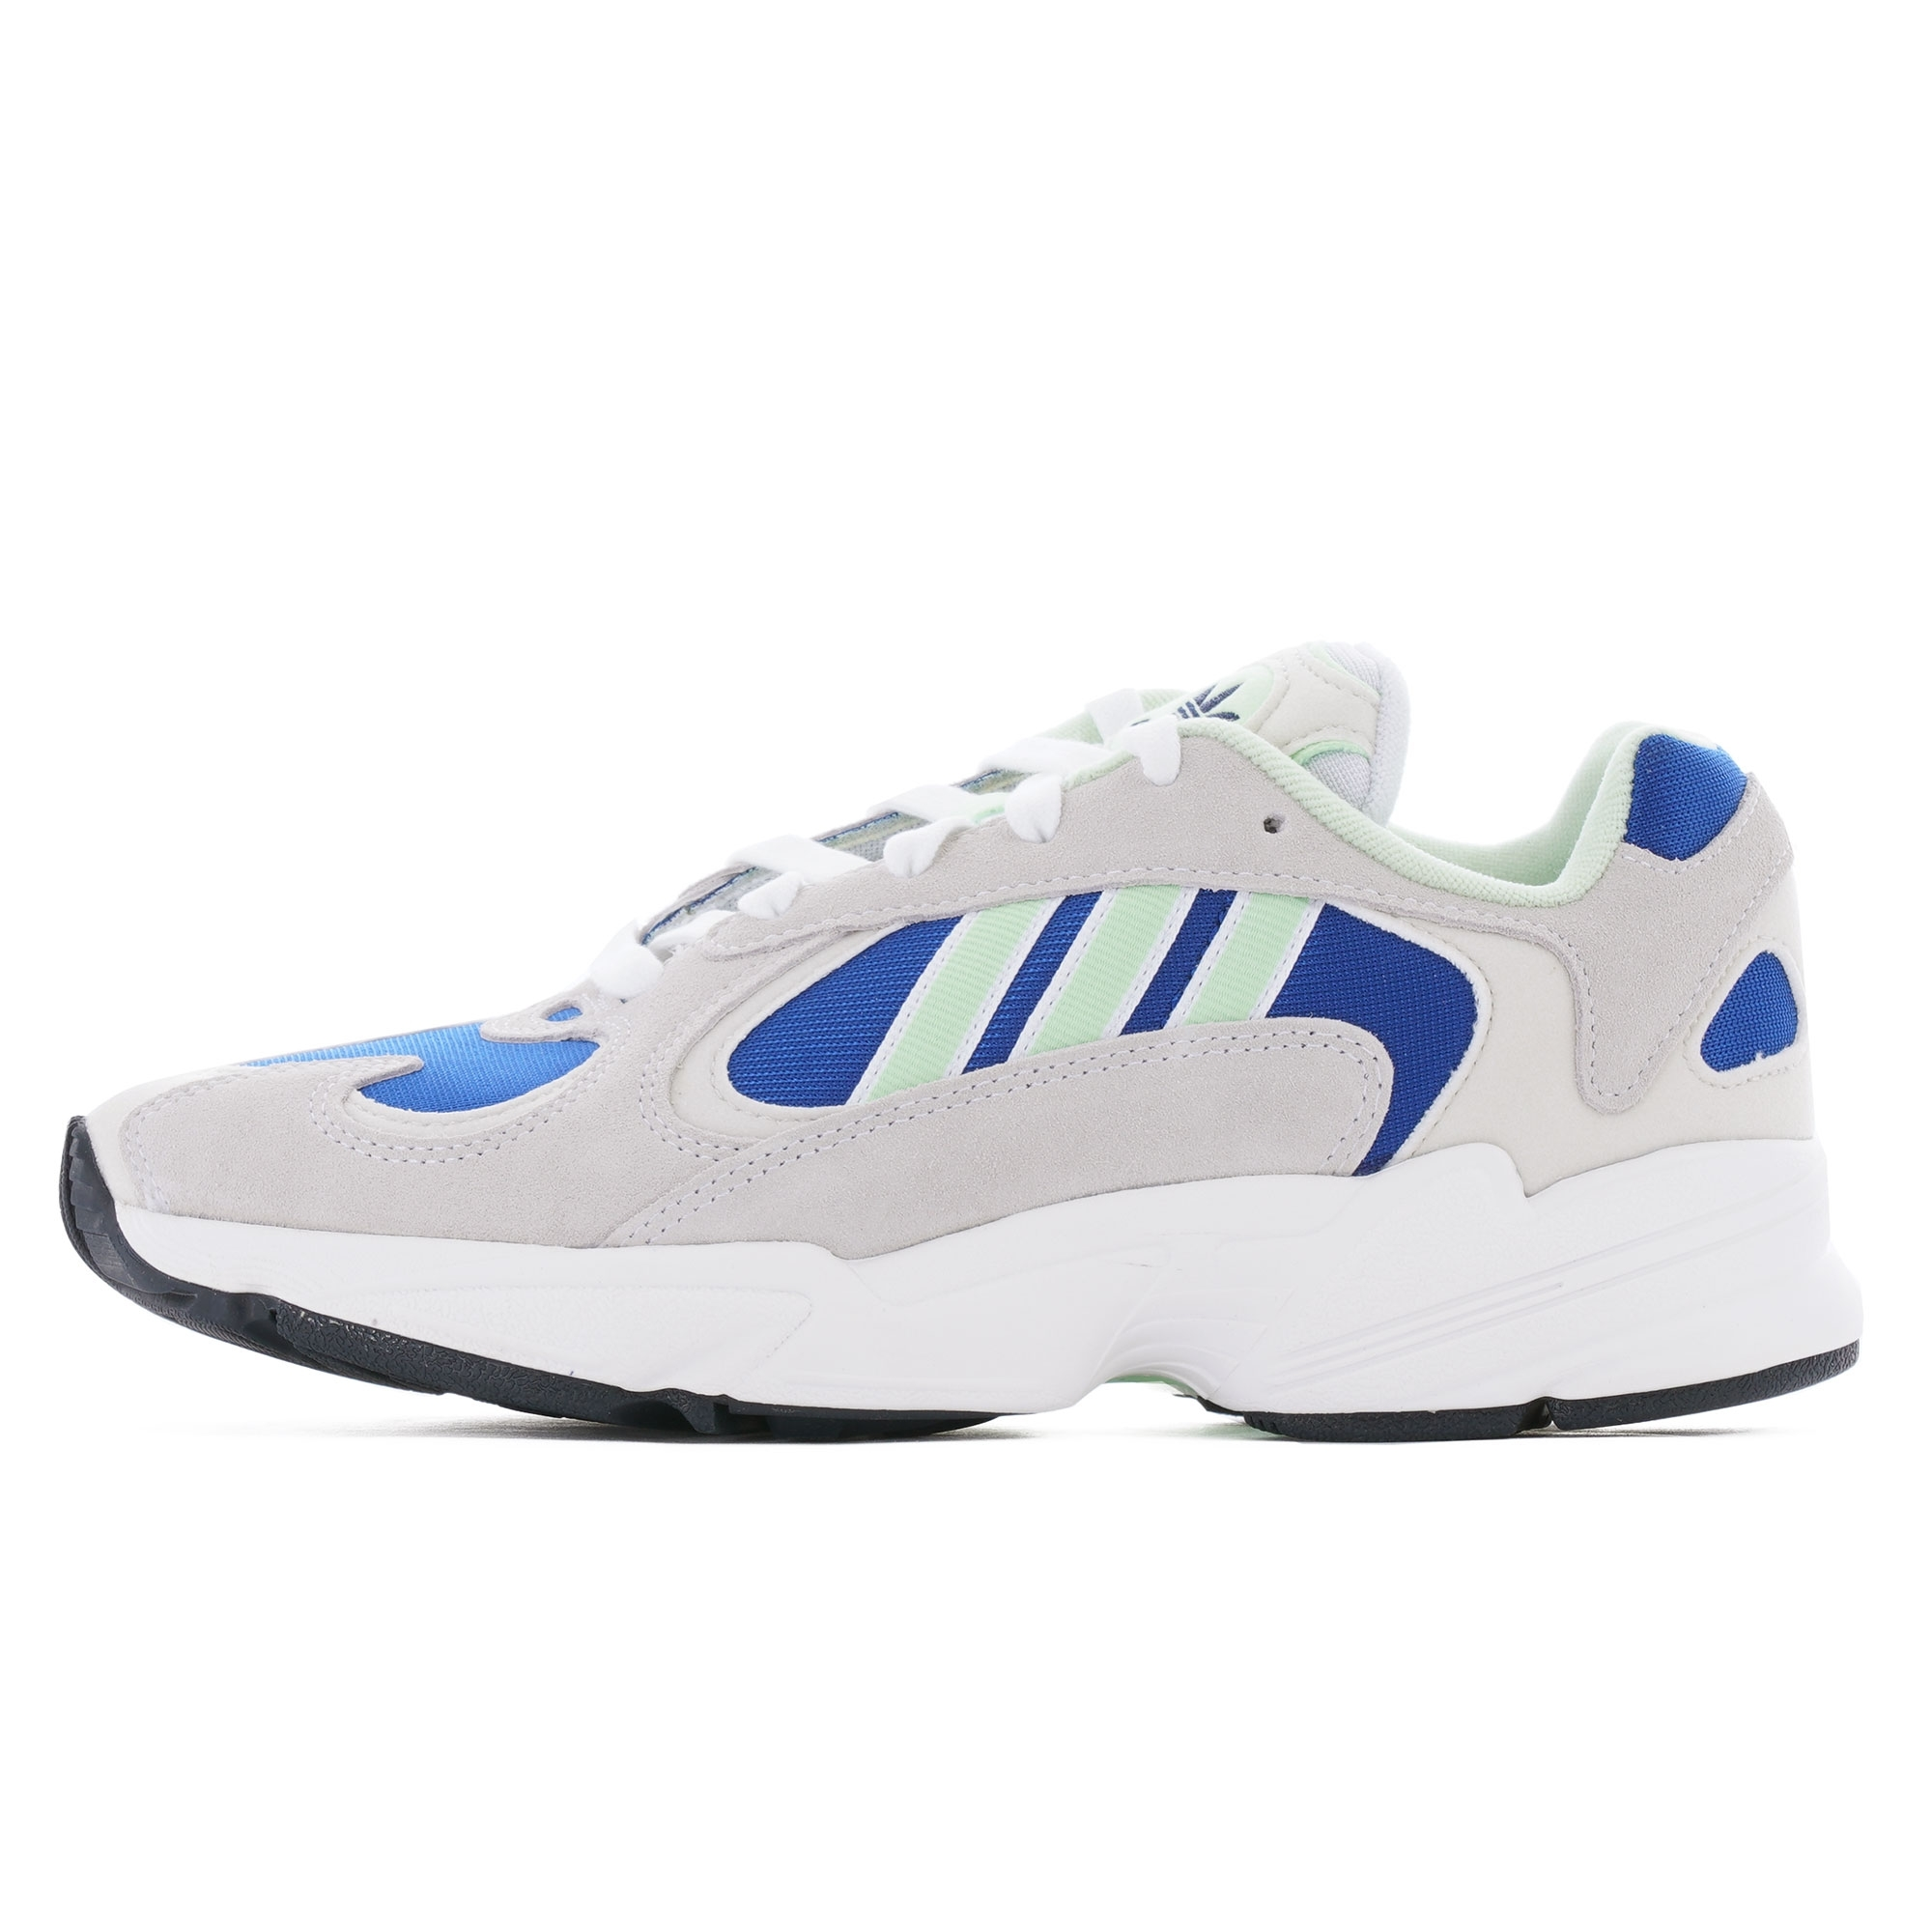 Adidas Originals Yung 1 - White \u0026 Blue